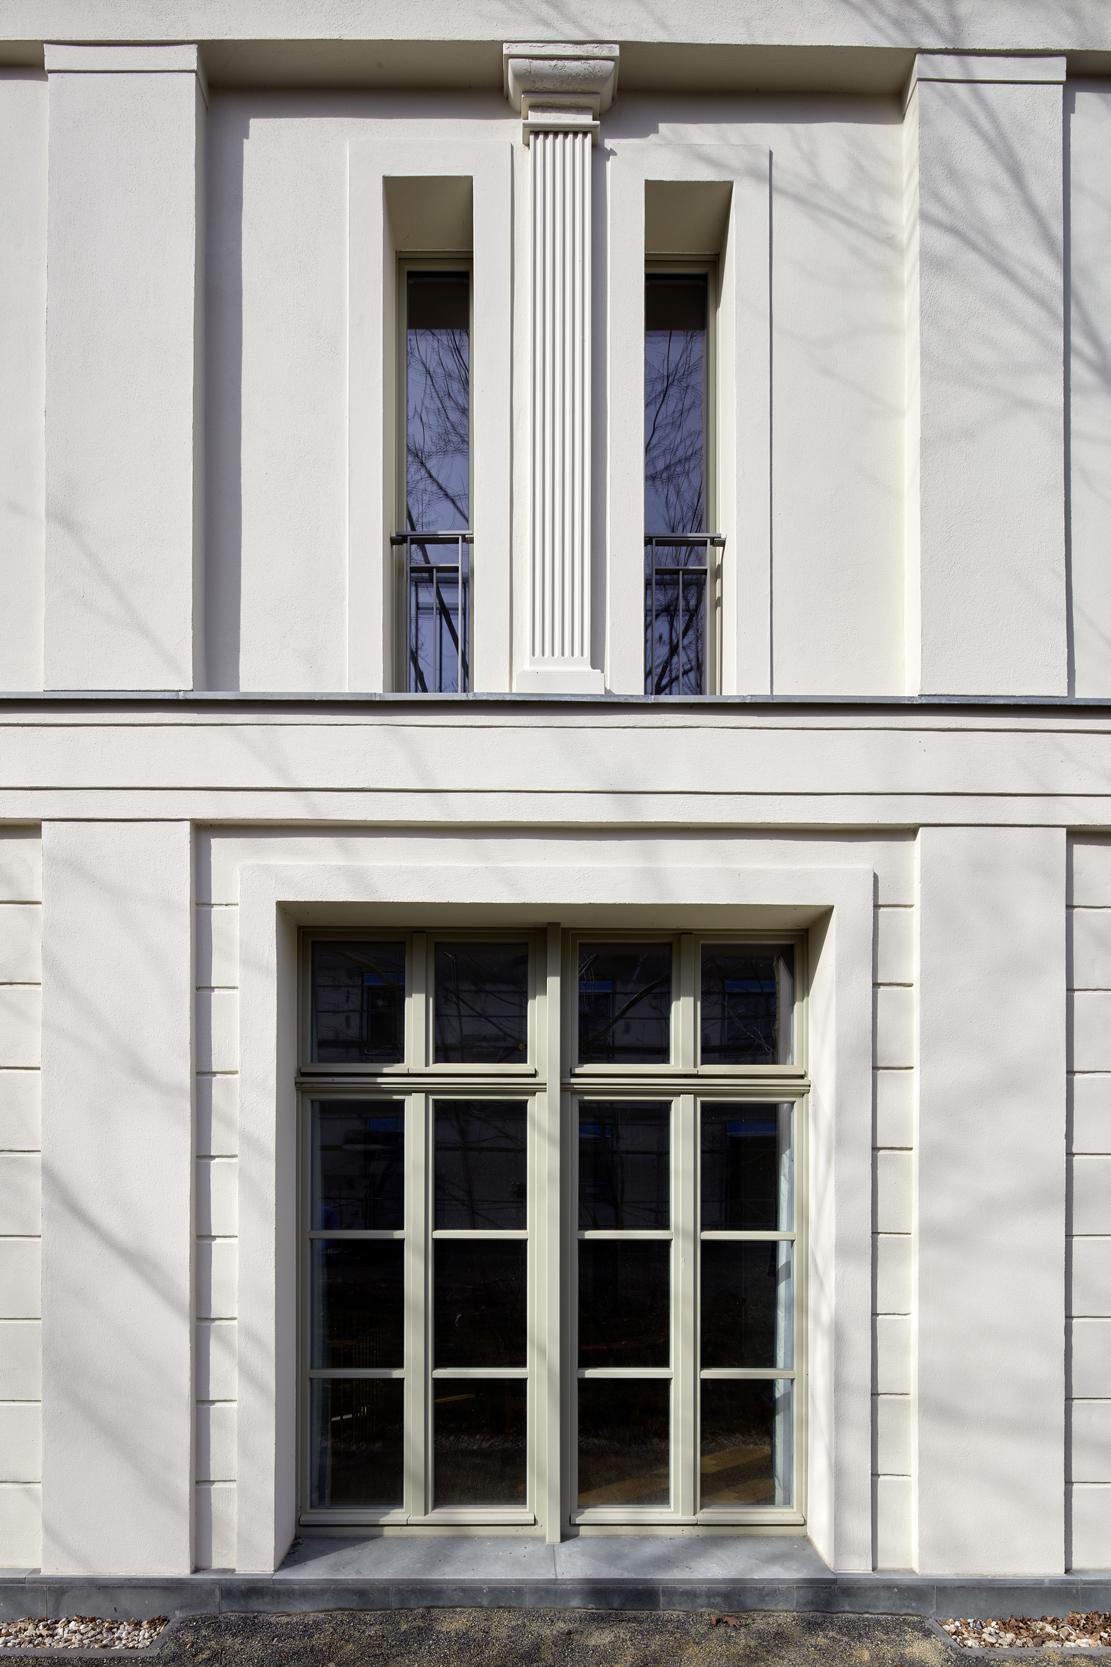 Detail profilierter Feinputz - Villa in klassisch traditionellem Baustil